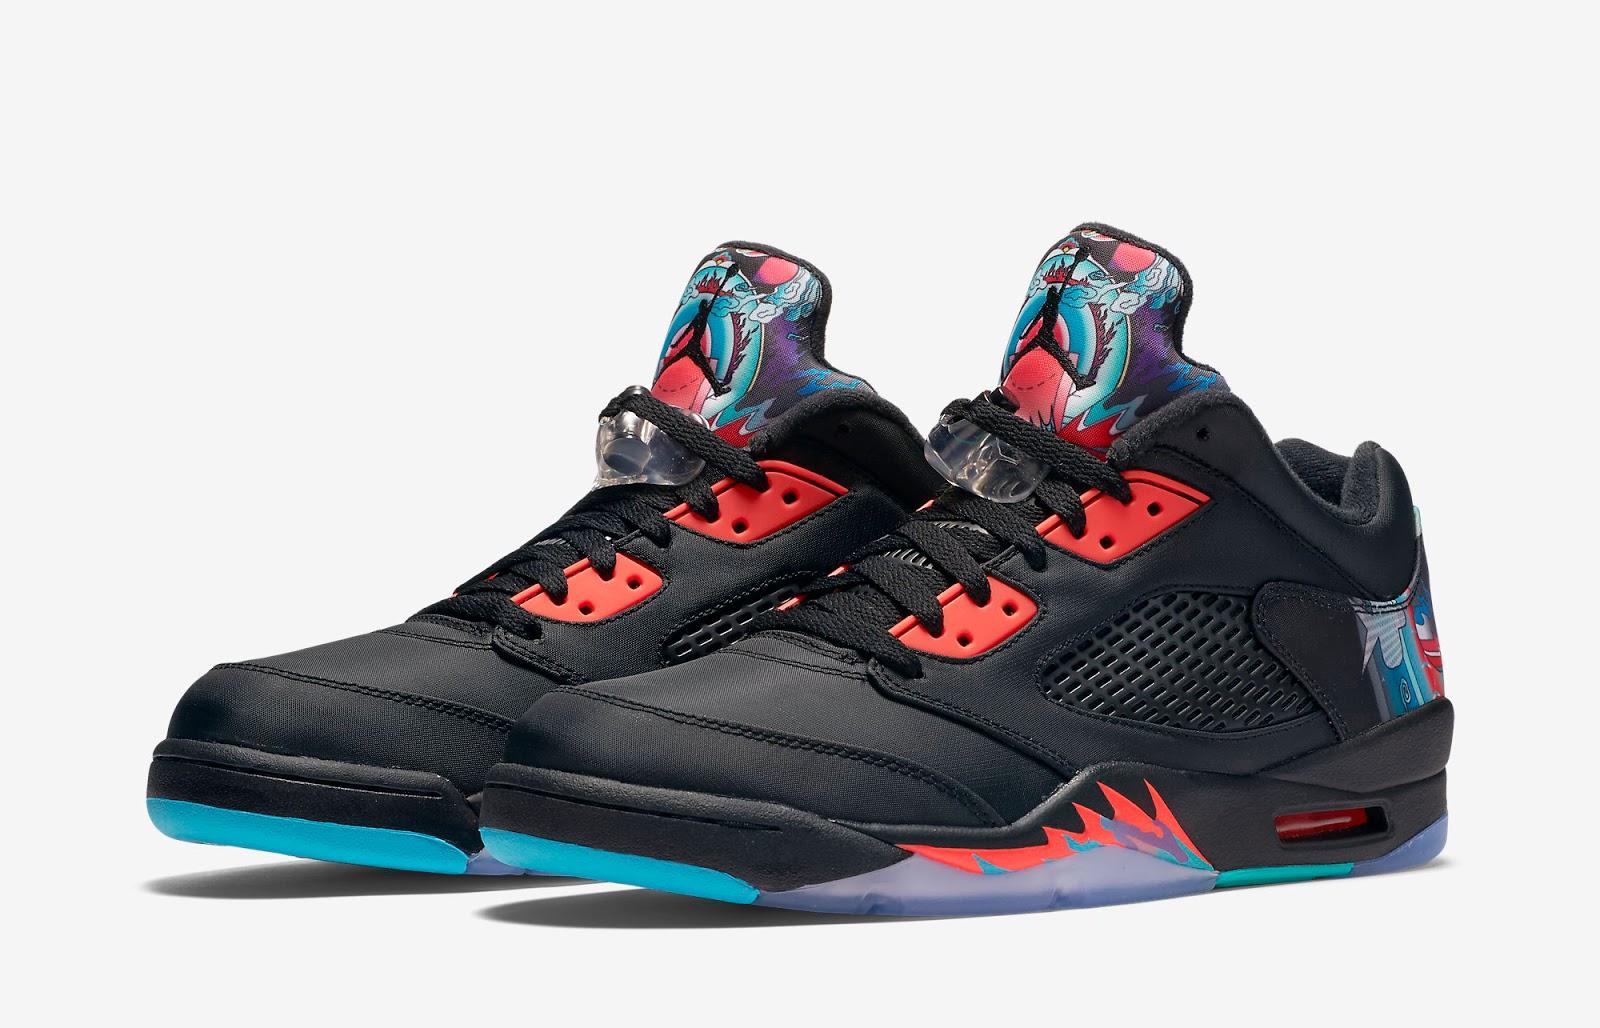 Nike Air Jordan 5 V Retro Low China CNY Black Bright Crimson